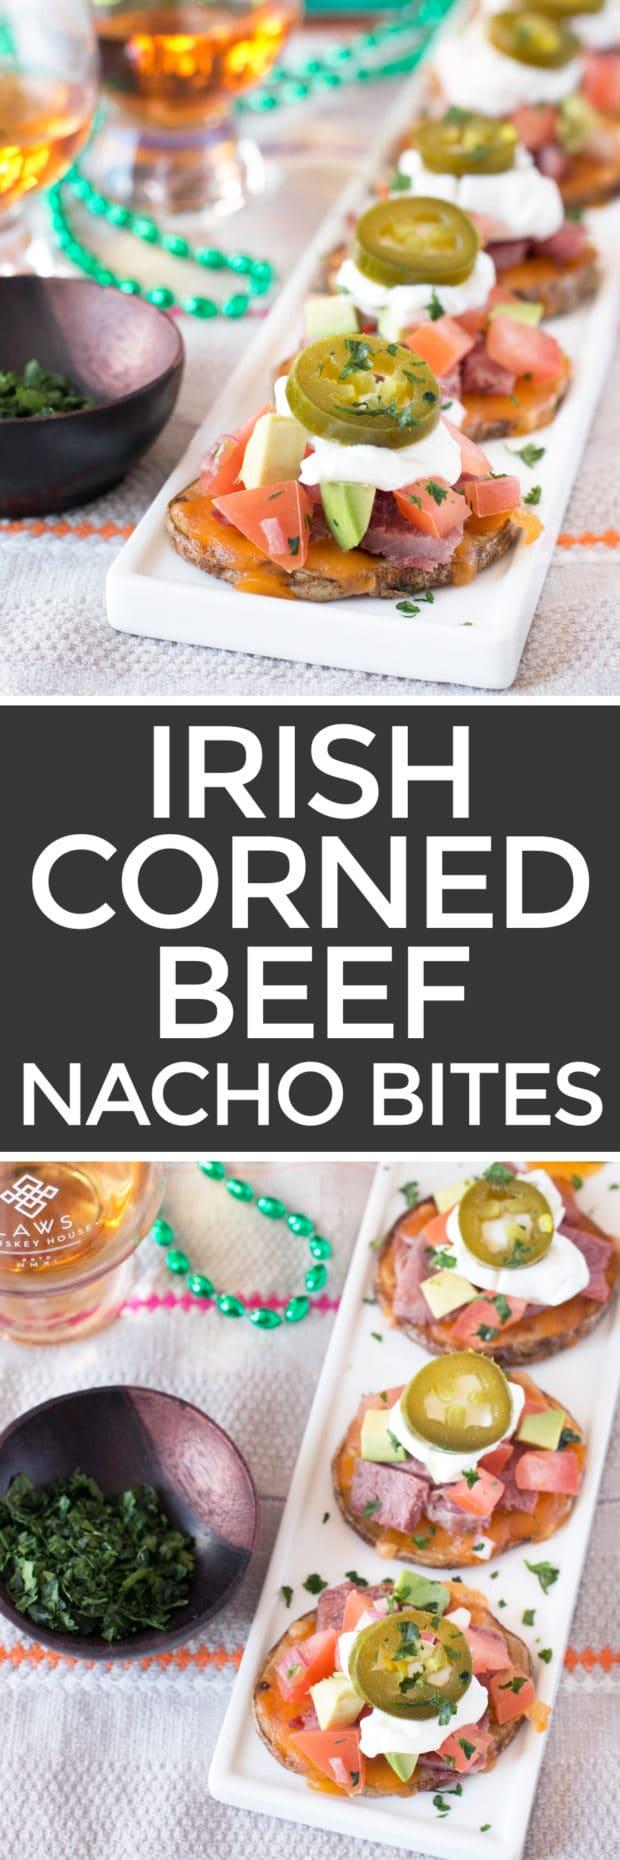 Irish Corned Beef Nacho Bites   cakenknife.com #appetizer #party